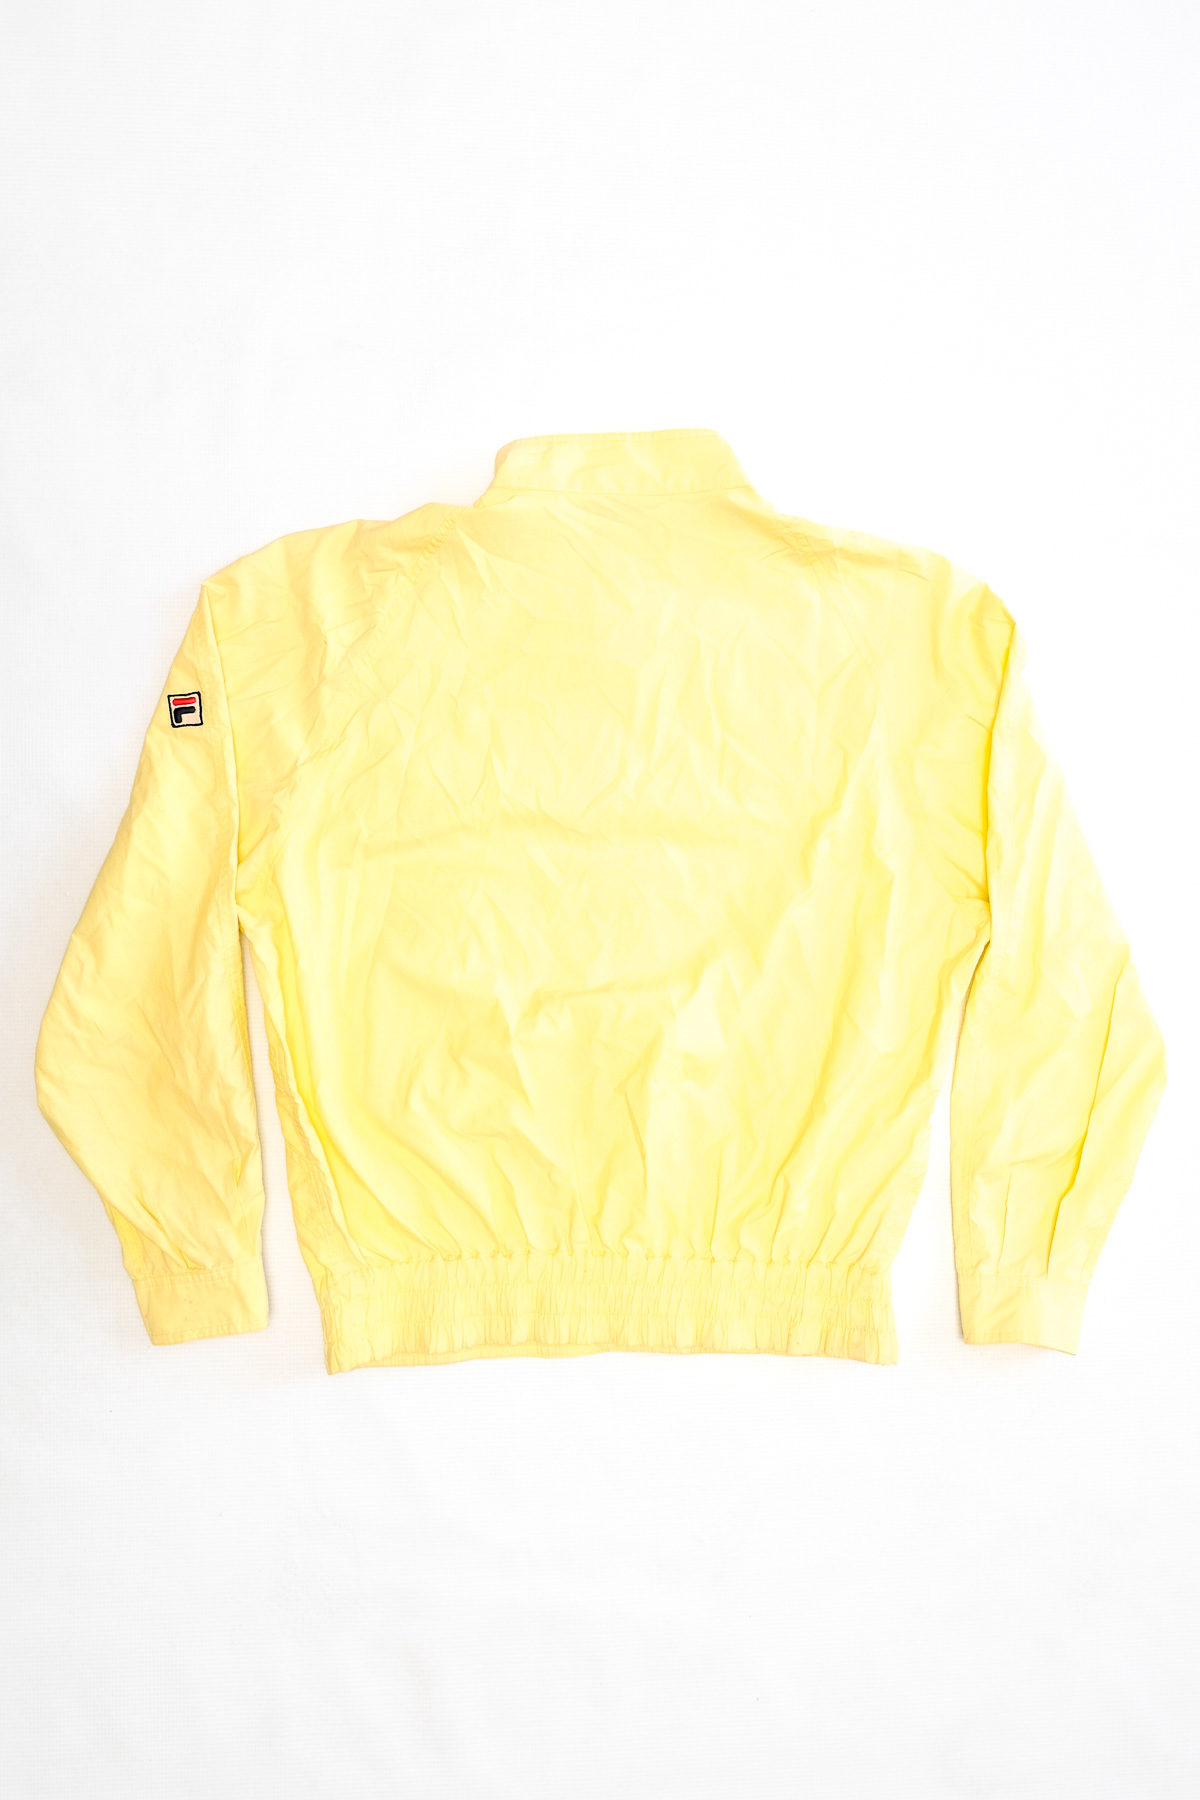 Fila GIUBBINO VINTAGE Yellow